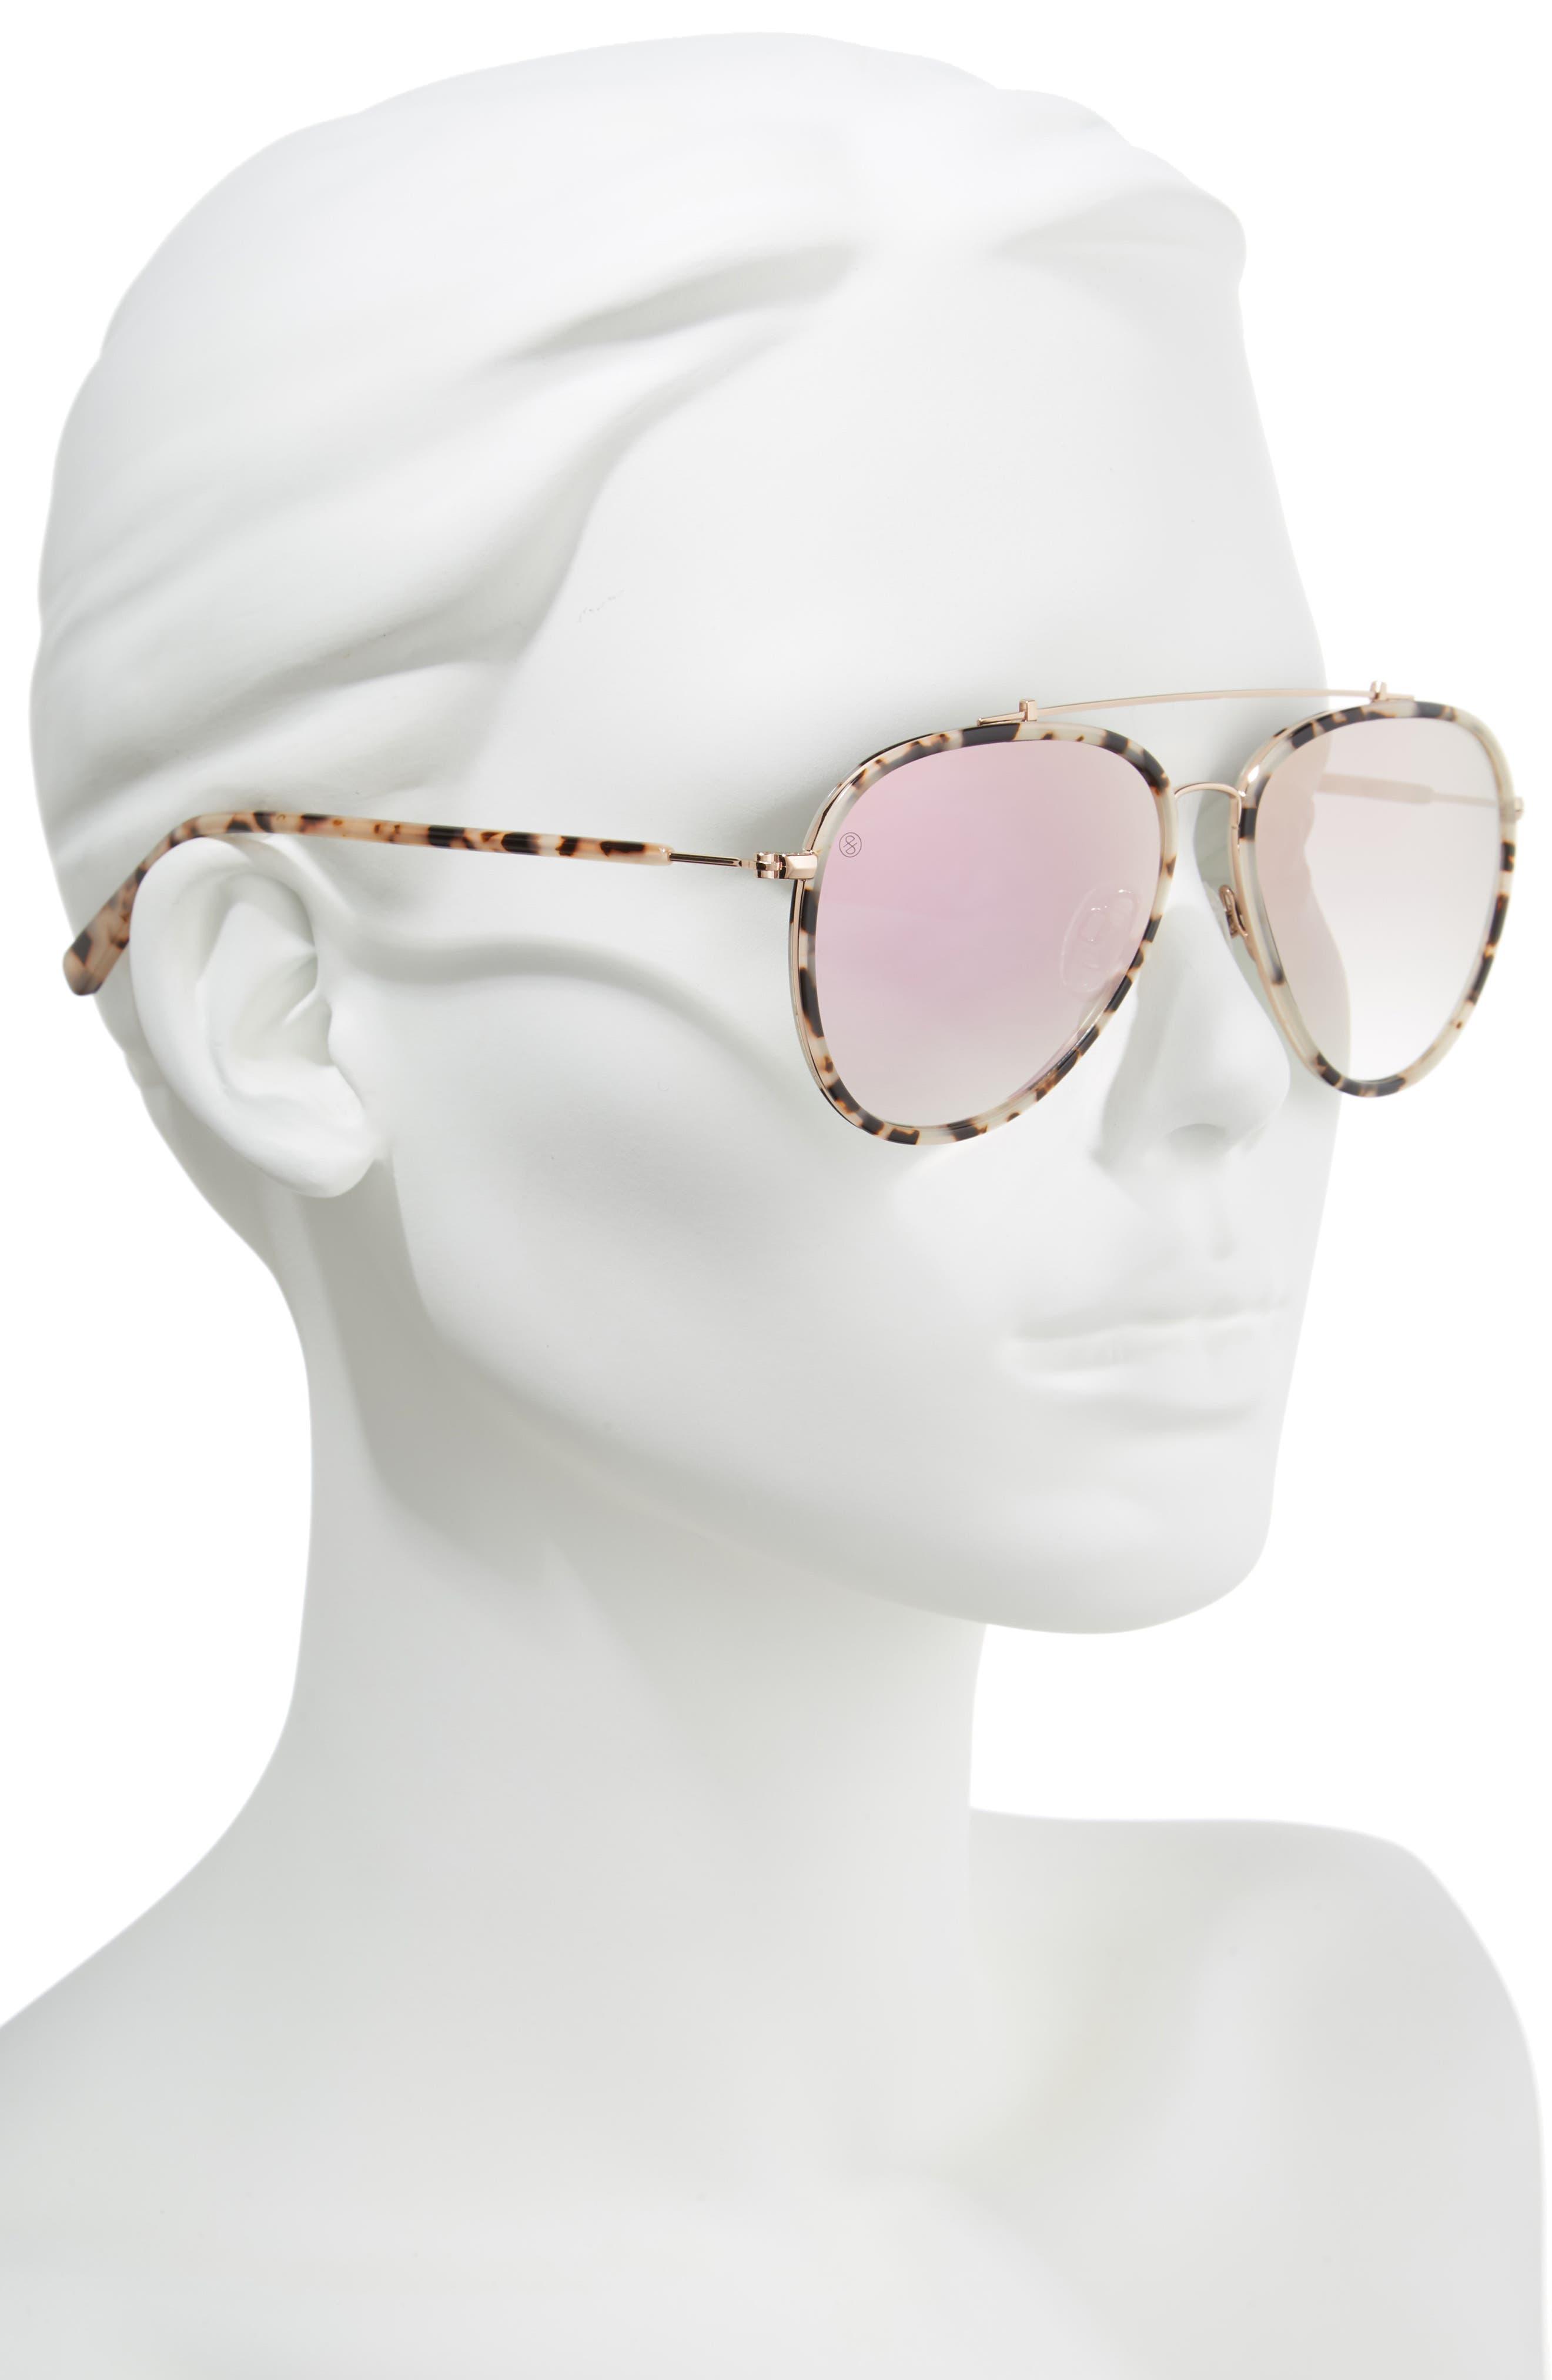 D'BLANC The Last 57mm Aviator Sunglasses,                             Alternate thumbnail 2, color,                             200